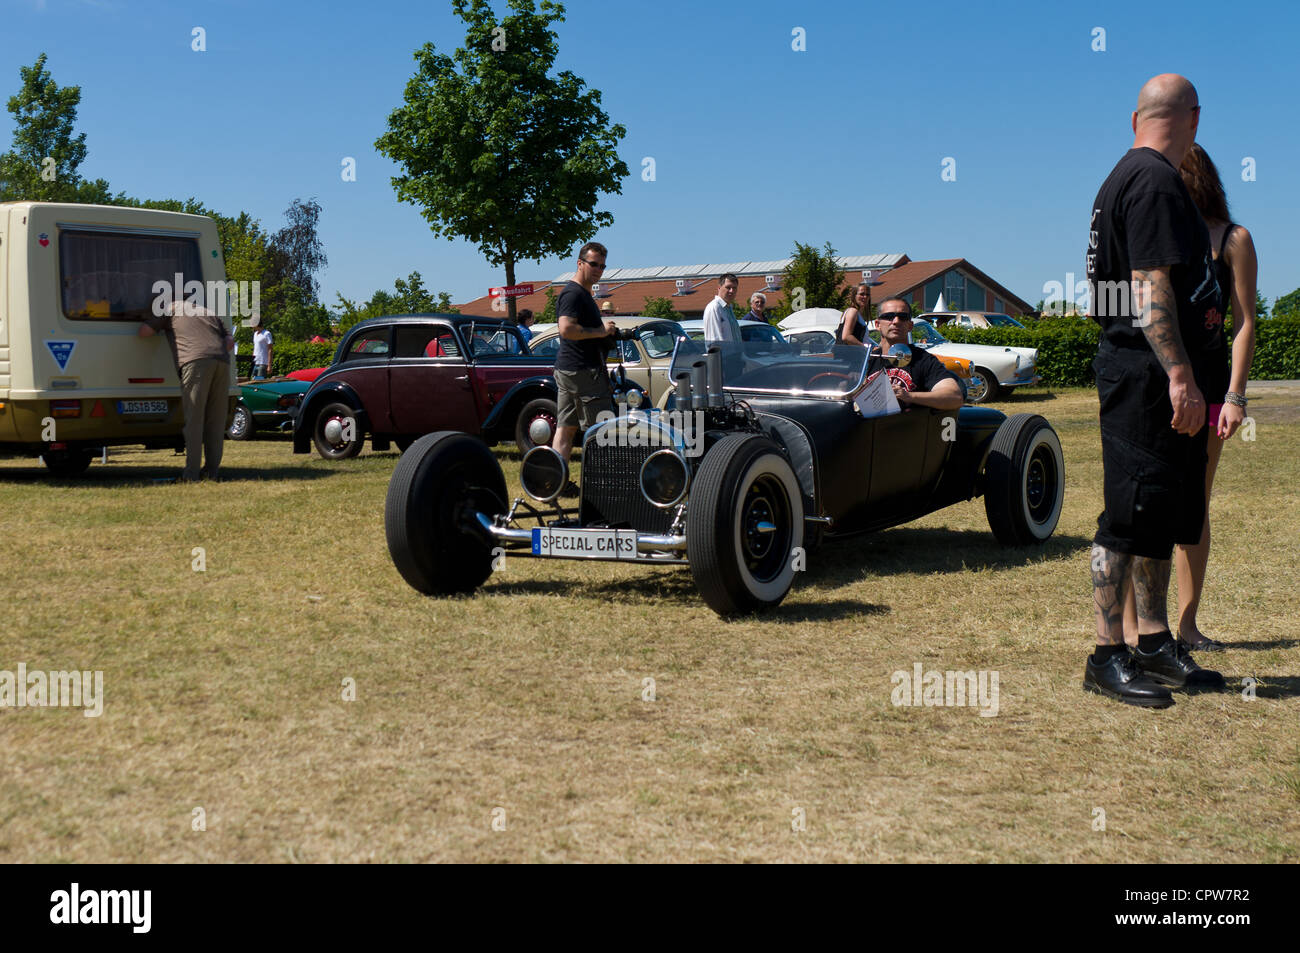 Cars Dodge Roaster Hot Road Stock Photo: 48498102 - Alamy